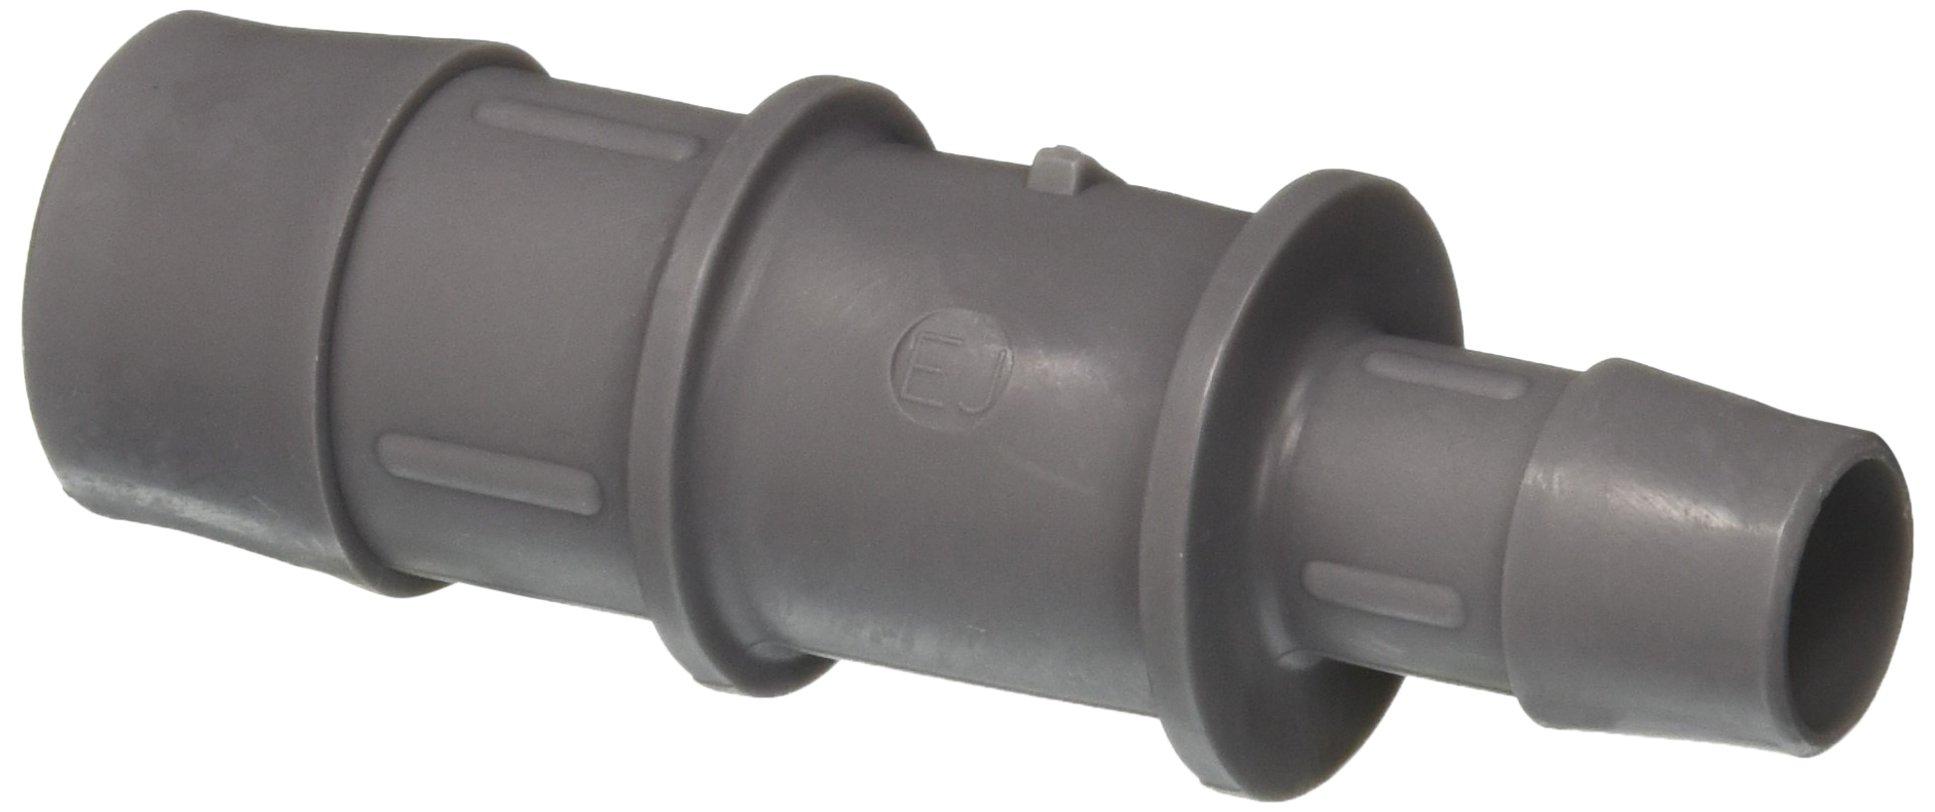 Eldon James C16-10PVDF Industrial Gray Kynar Reduction Coupler, 1'' Hose Barb to 5/8'' Hose Barb (Pack of 10)